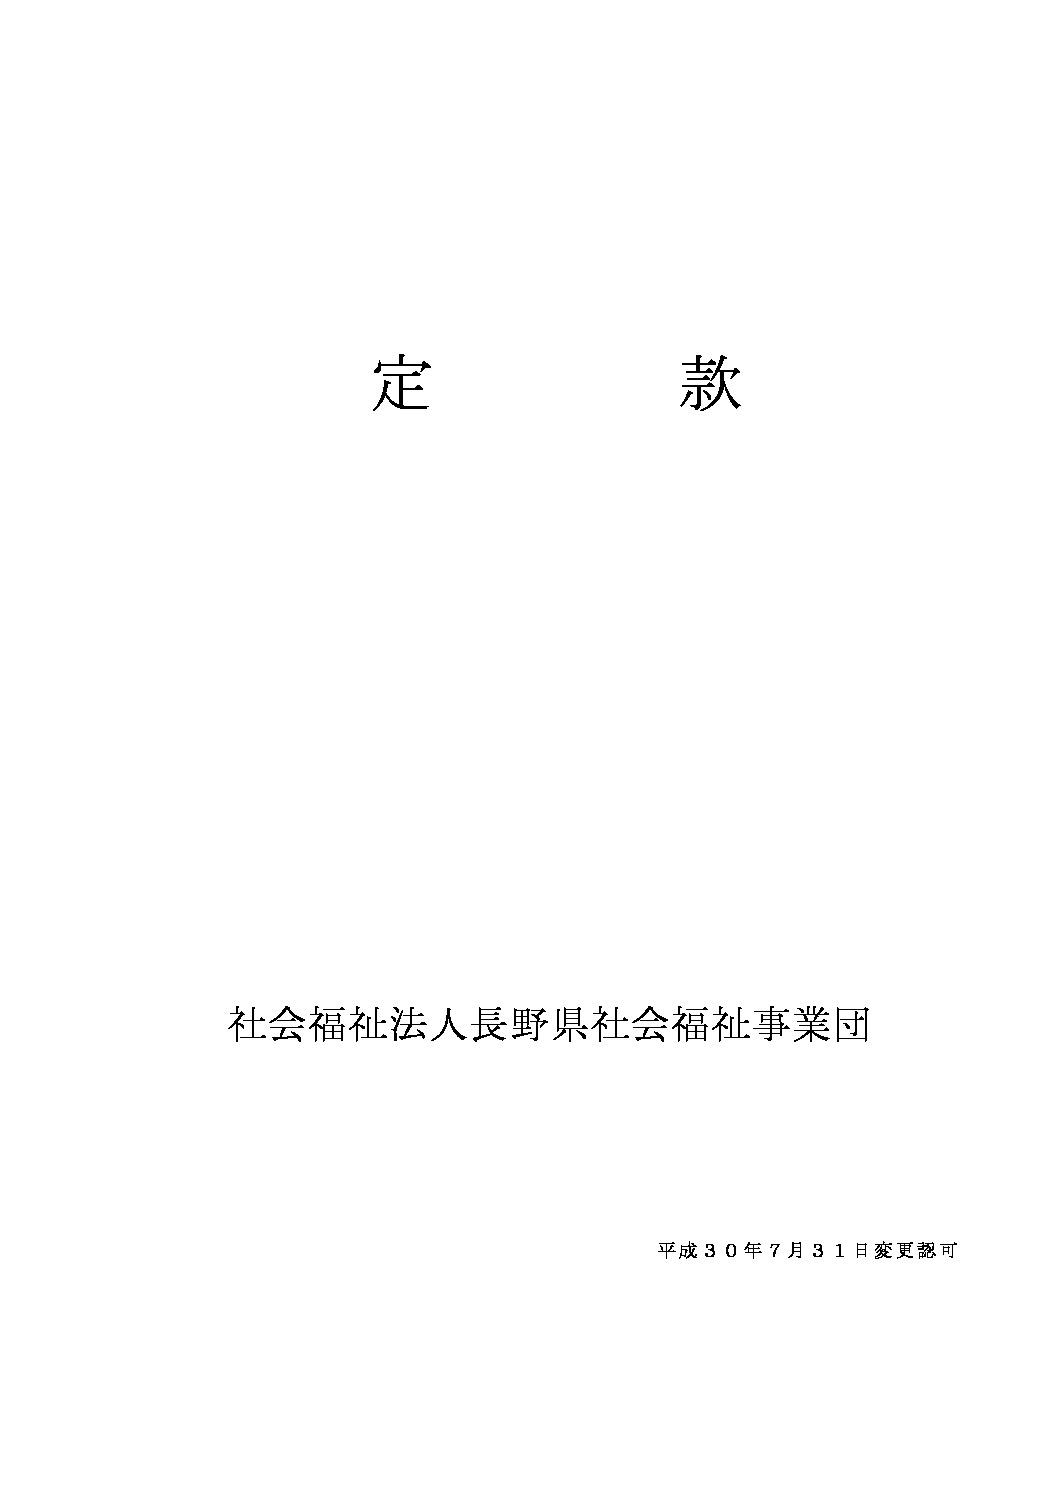 teikan_20180731 (1)のサムネイル